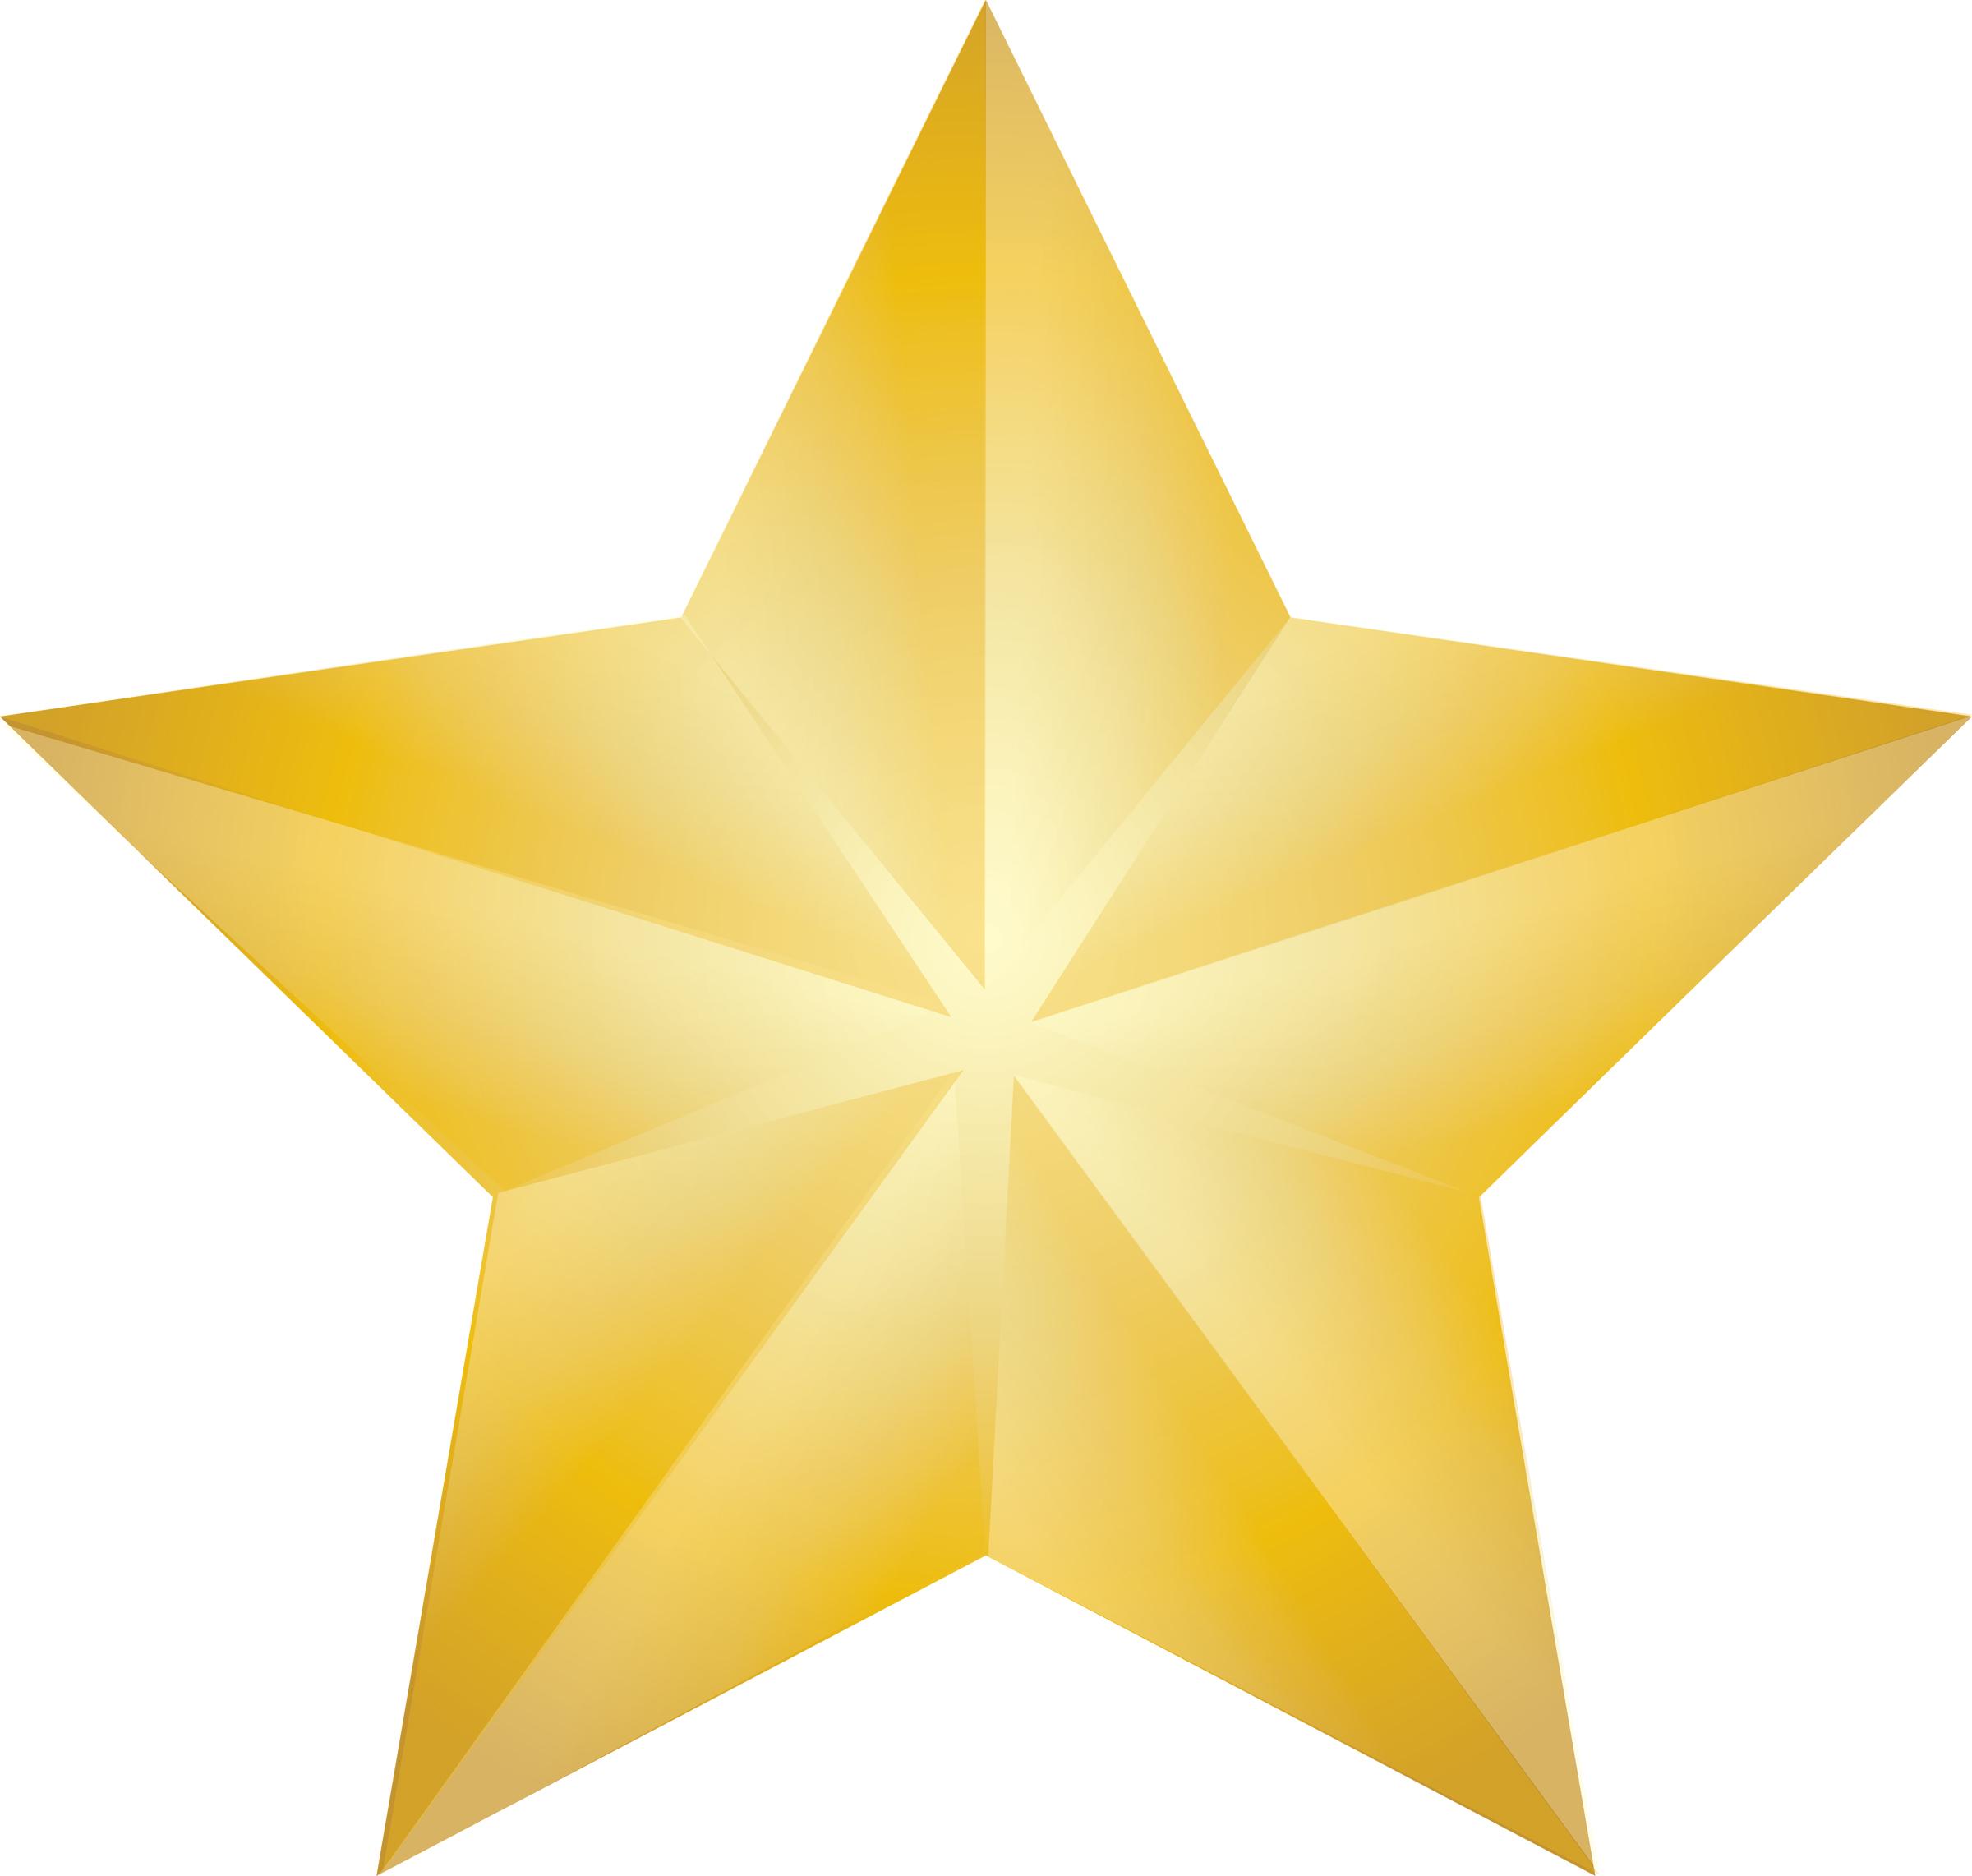 All star . Celebration clipart award